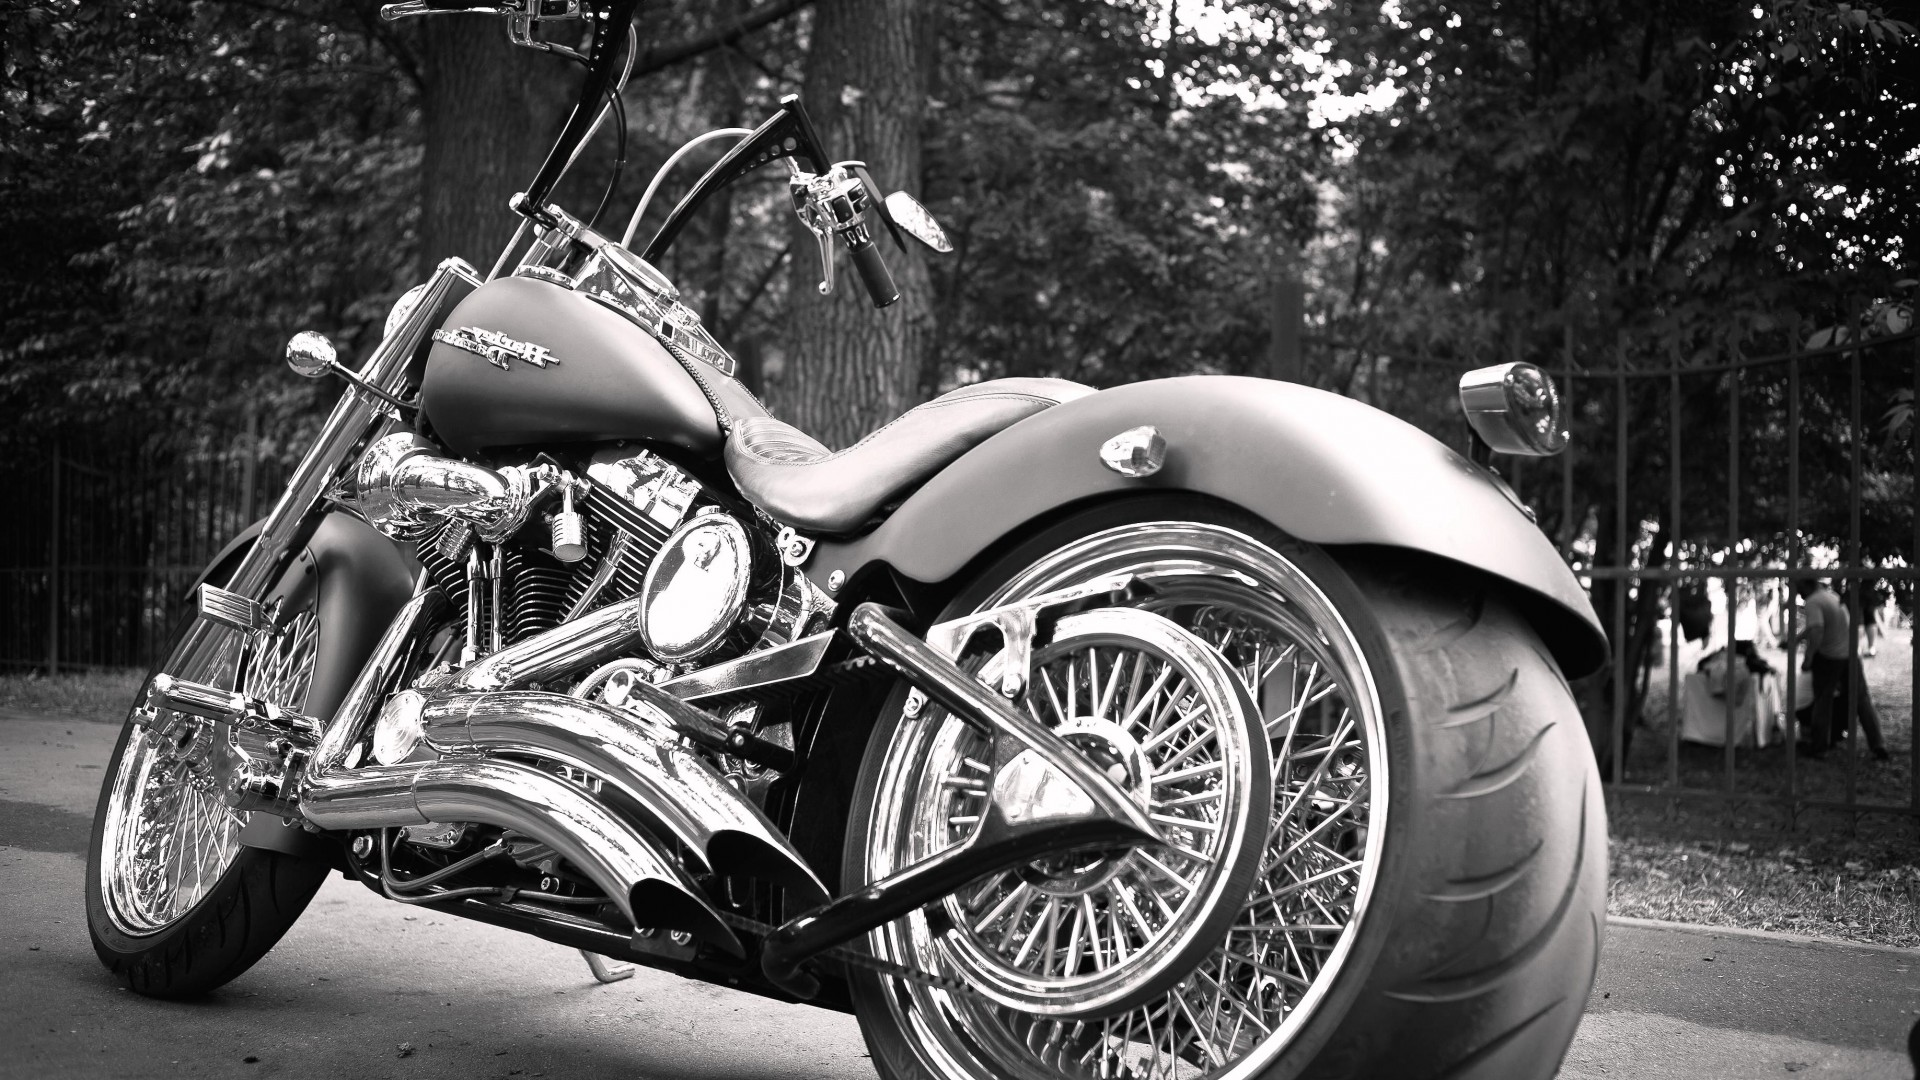 Free Download Harley Davidson Hd Wallpaper Download